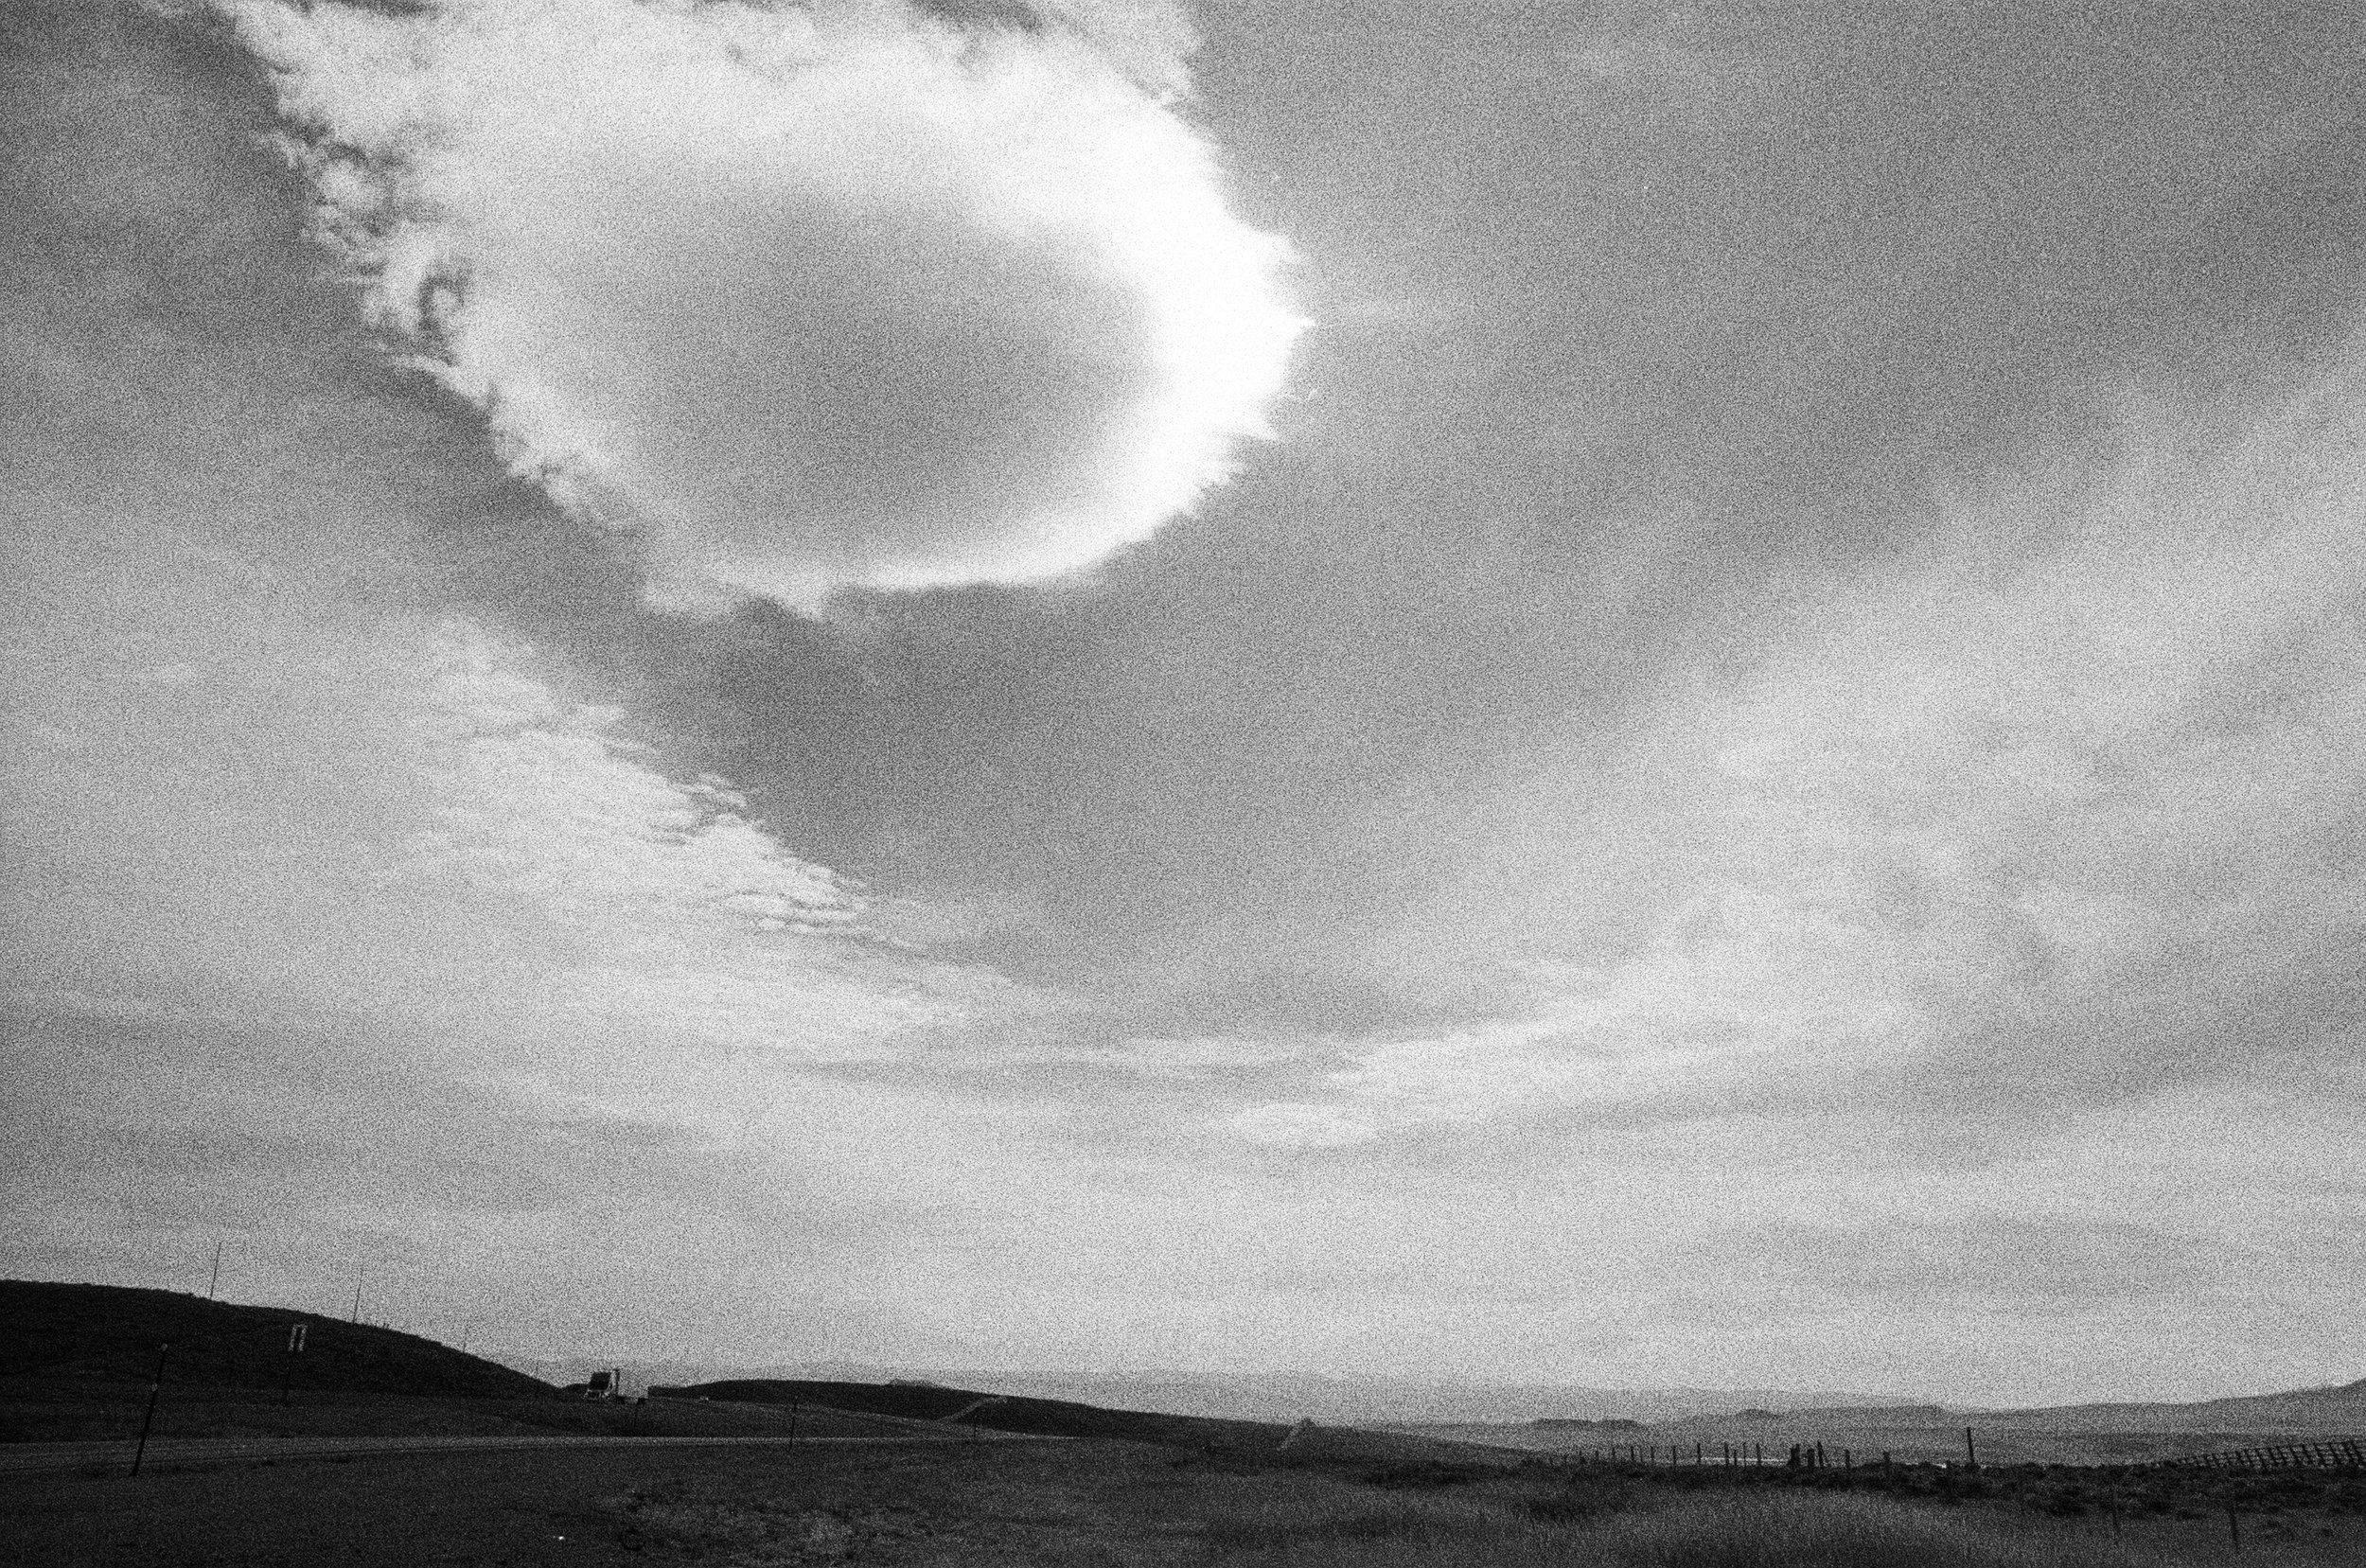 I-80 Roadside, Wyoming, 10/25/16 © Sarah Windels